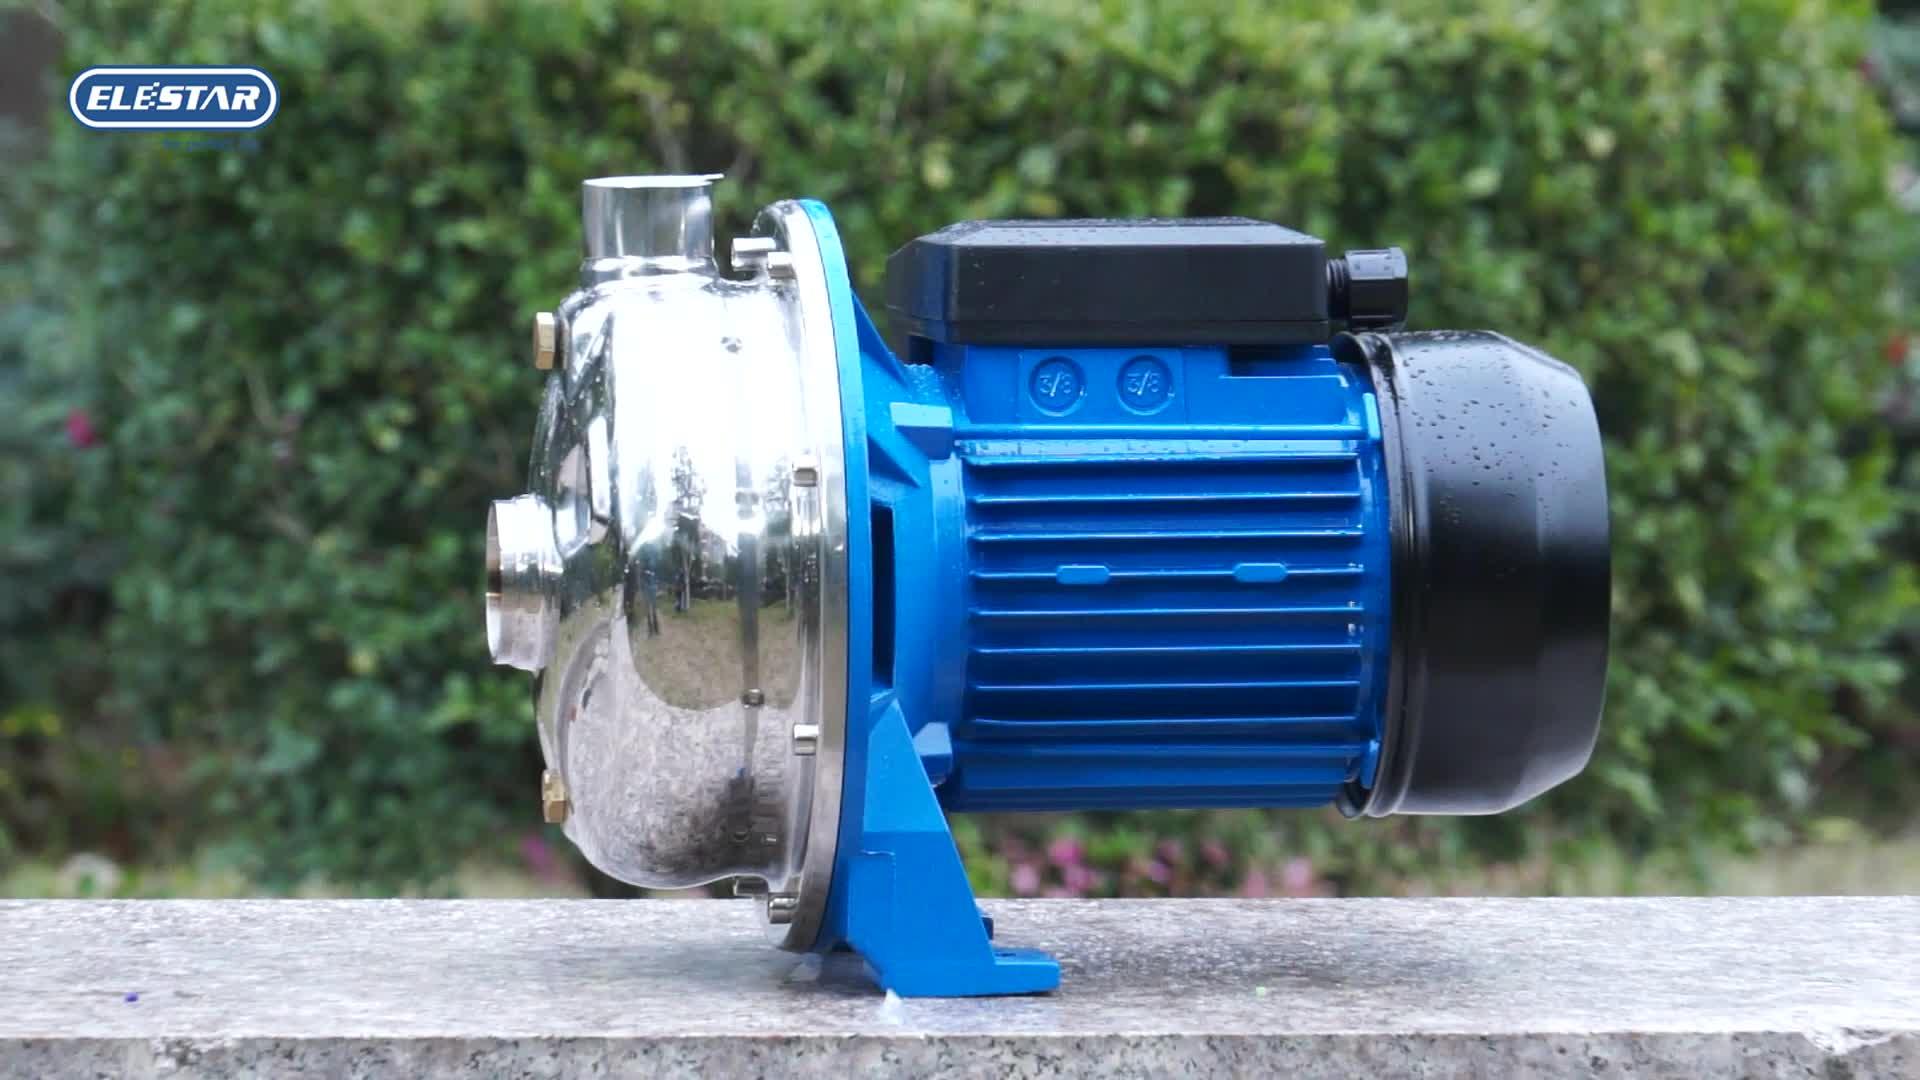 2 ELESTAR SCM-ST Pump Water Pump prices india